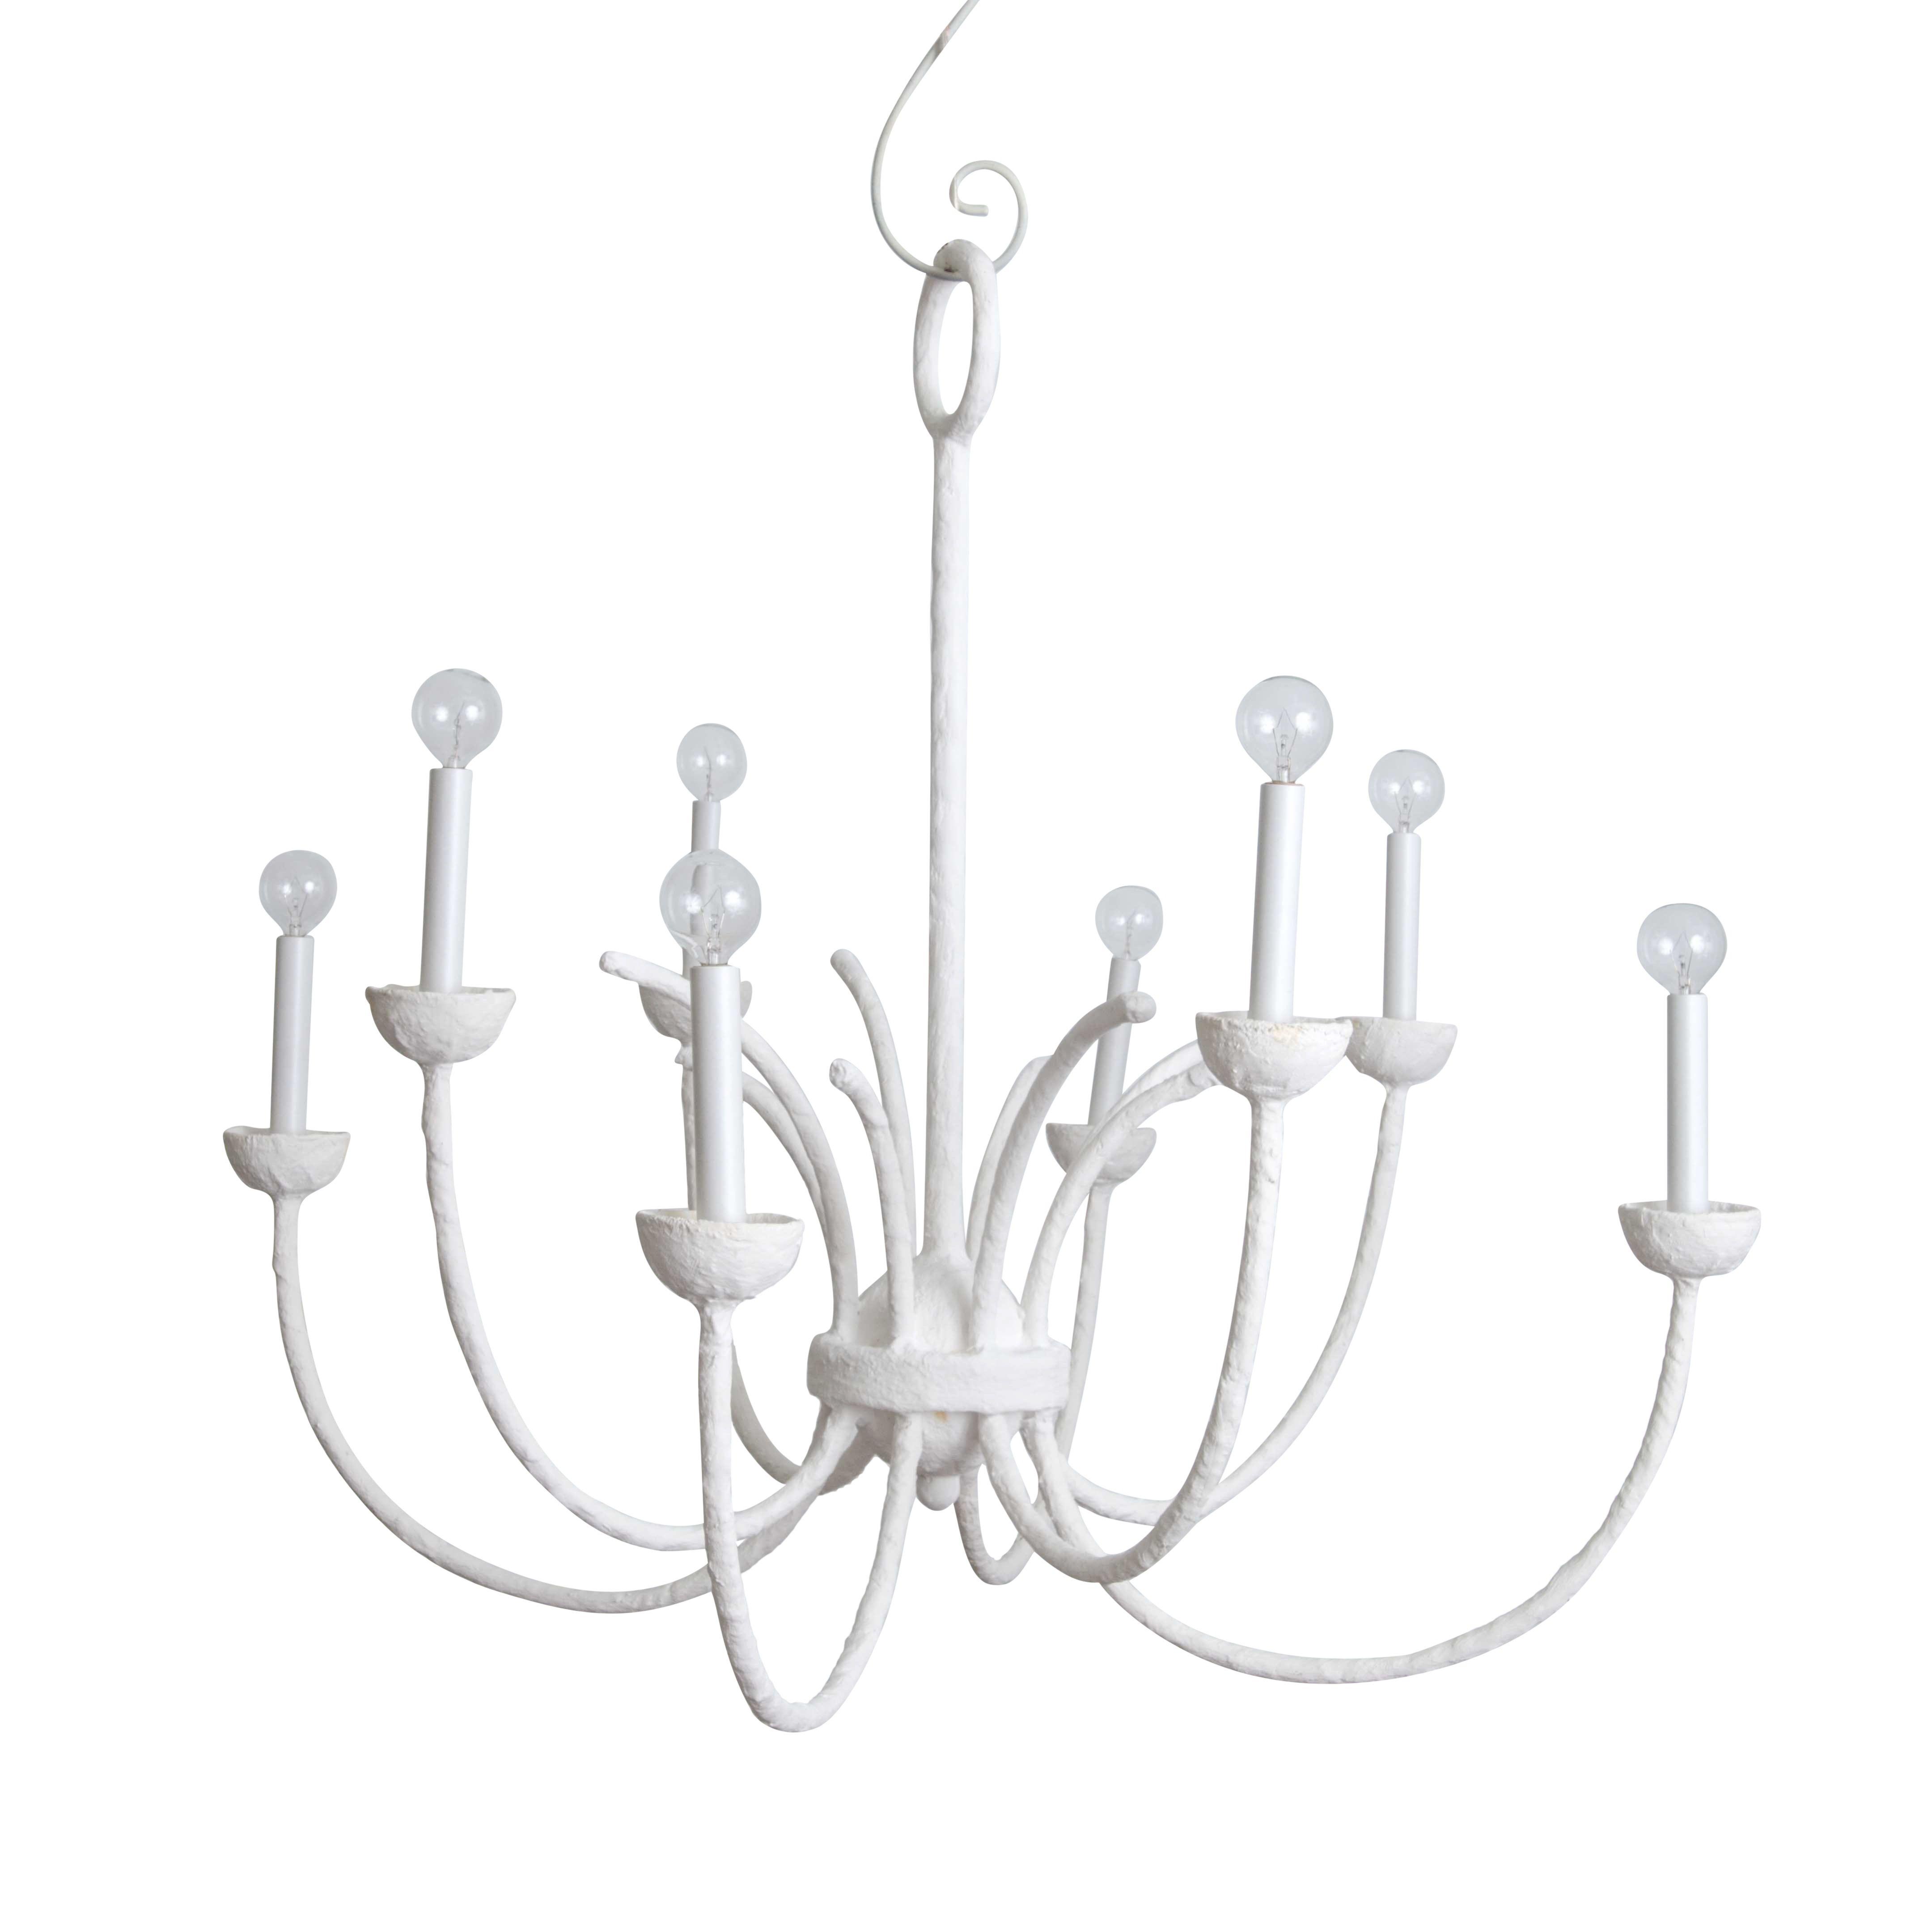 Buy jupiter chandelier from julie neill designs on dering hall